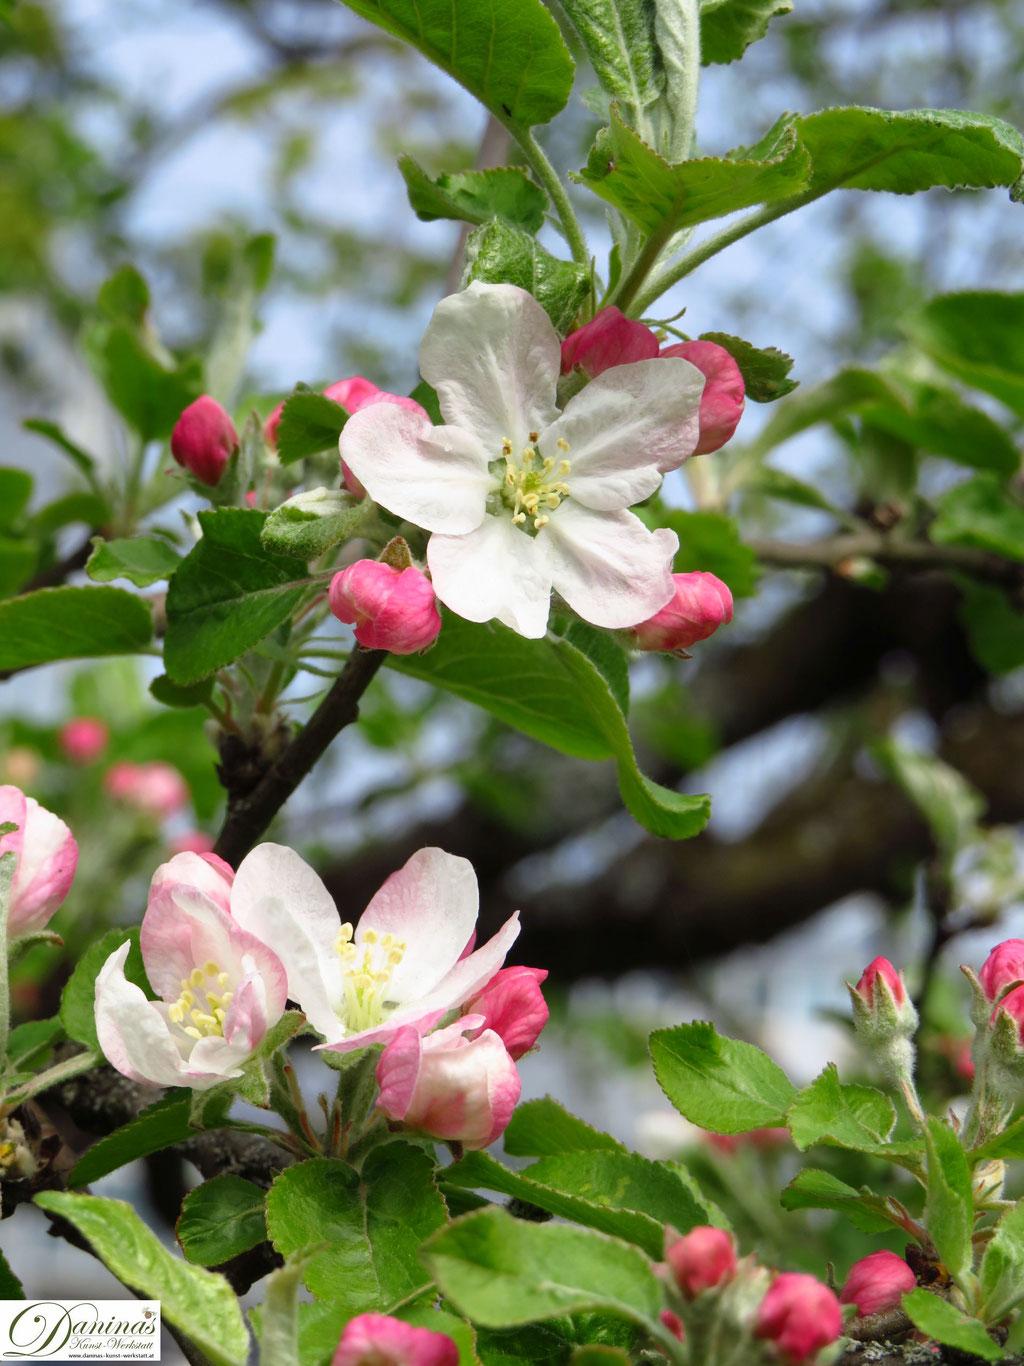 Apfelbaum - Apfelblüten im Frühling